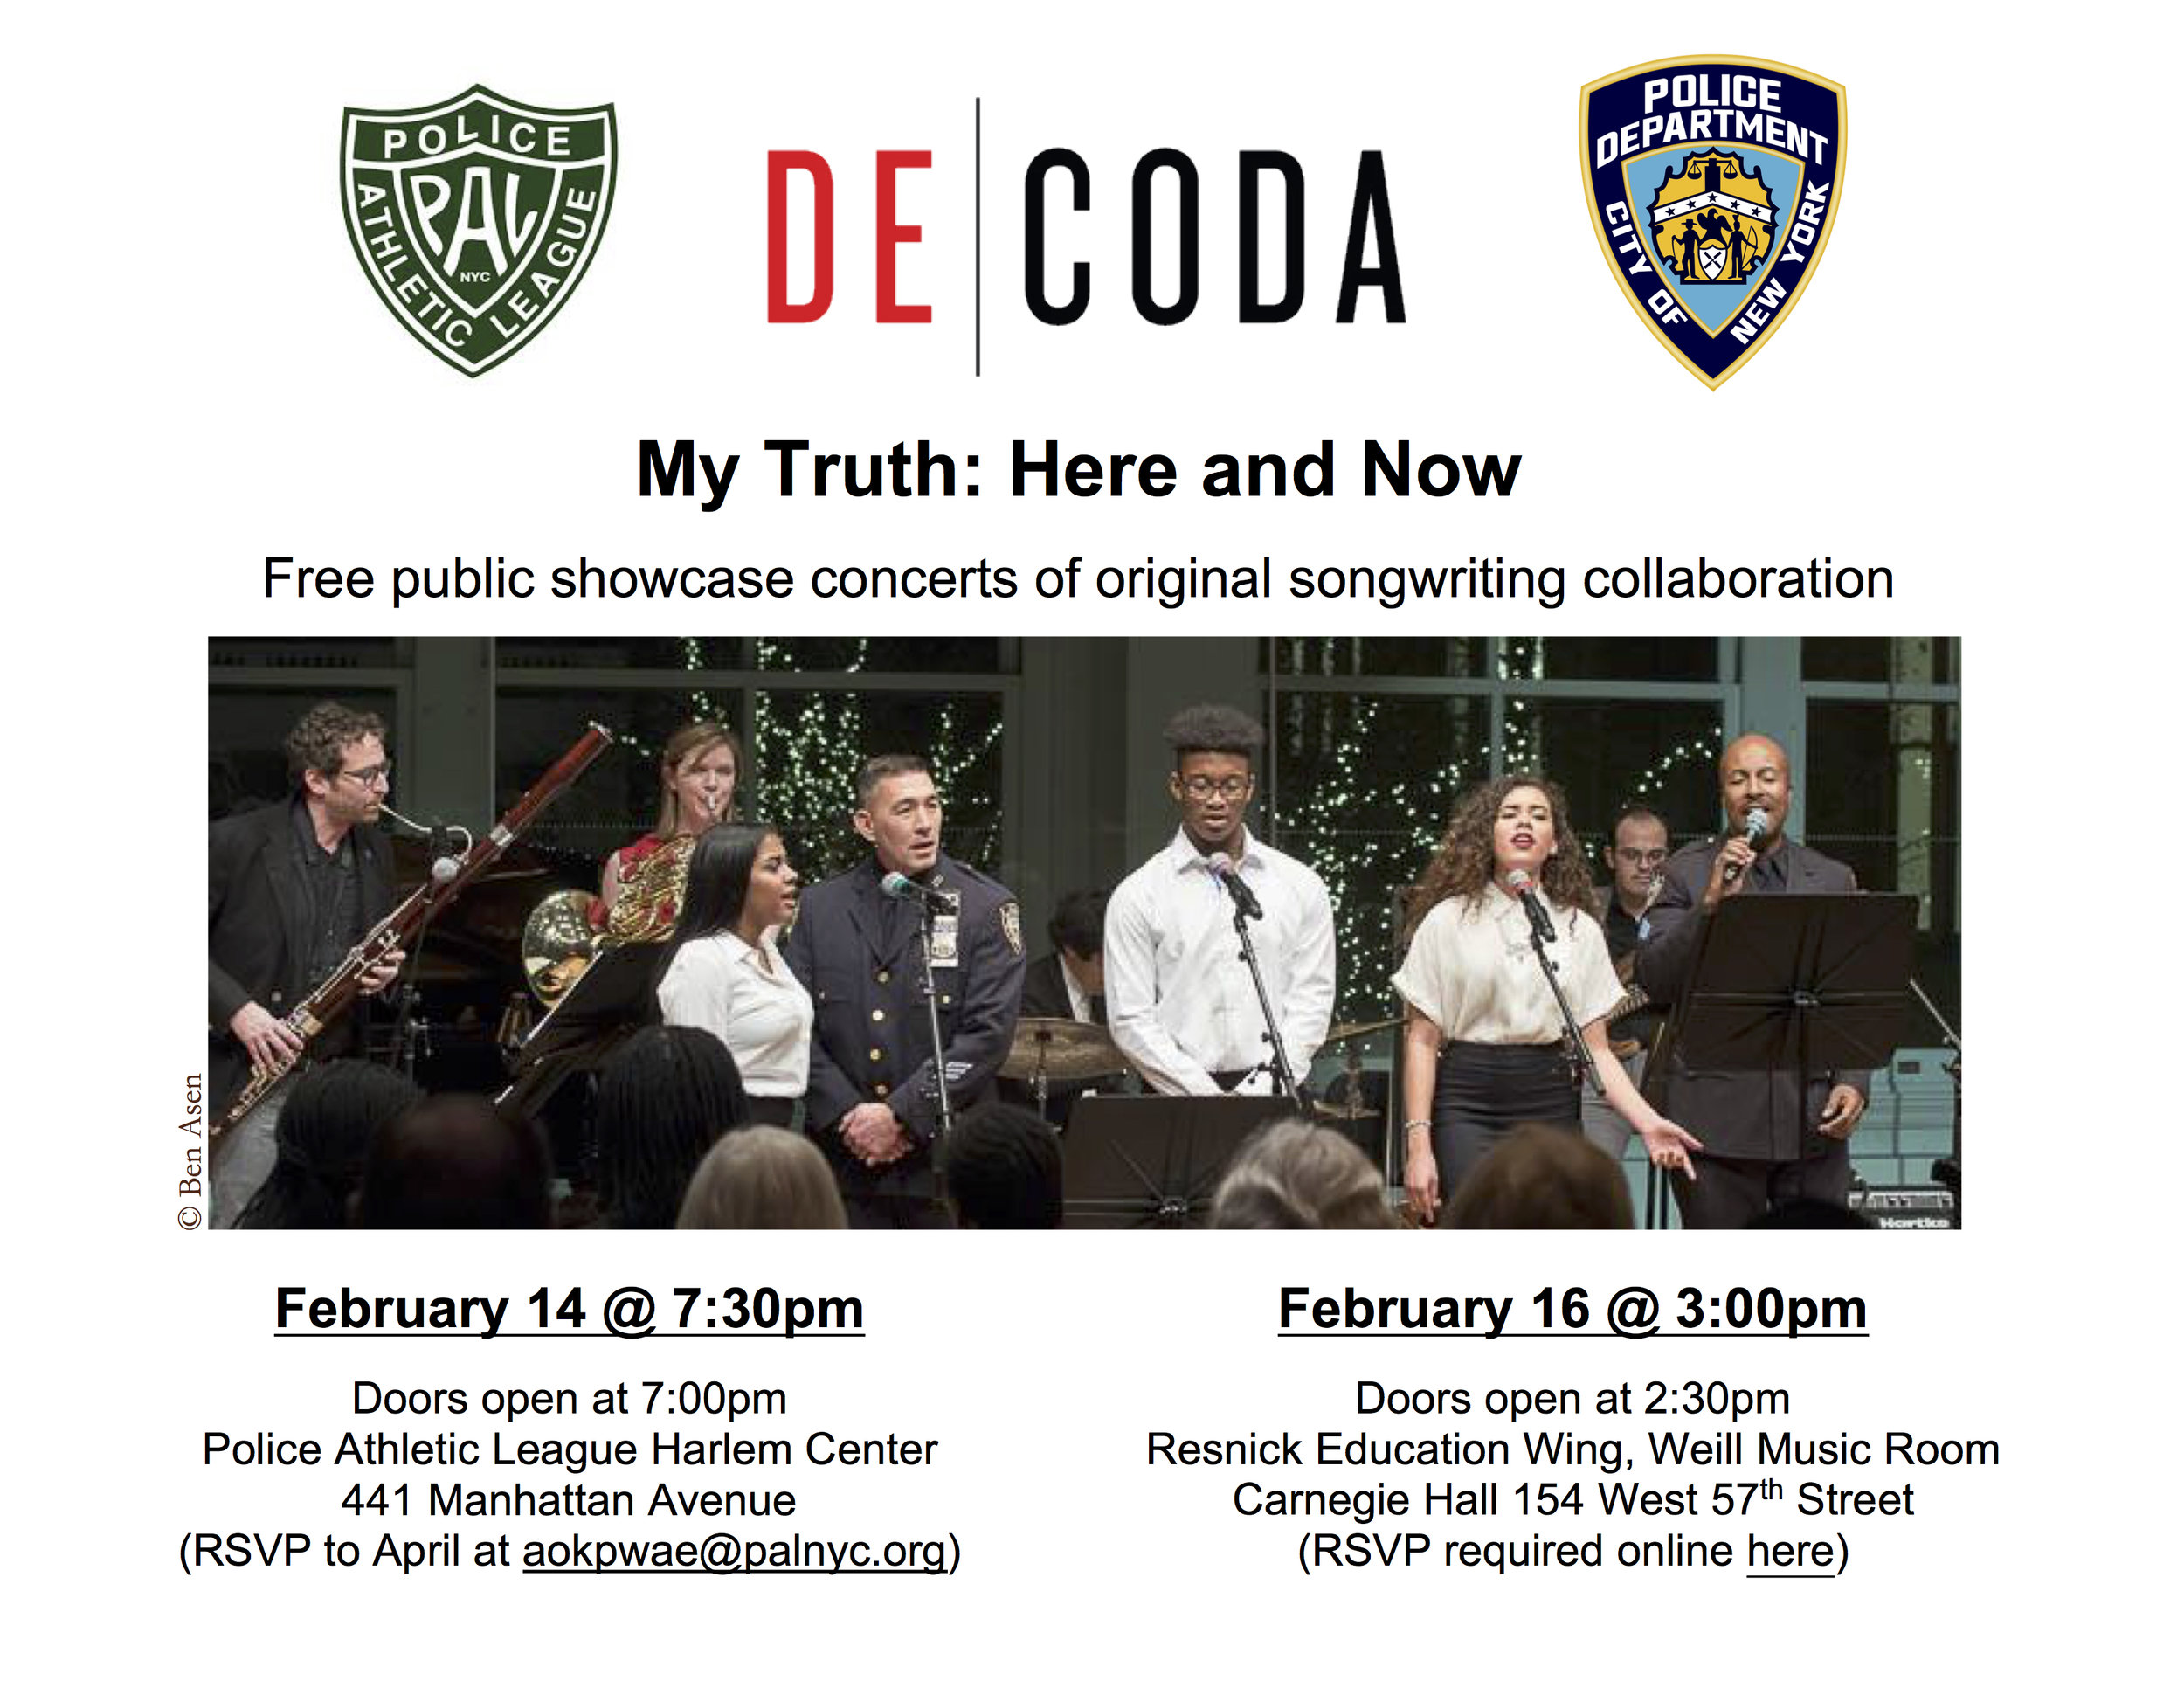 Carnegie Hall Calendar February 14, 2019 upcoming events — Decoda